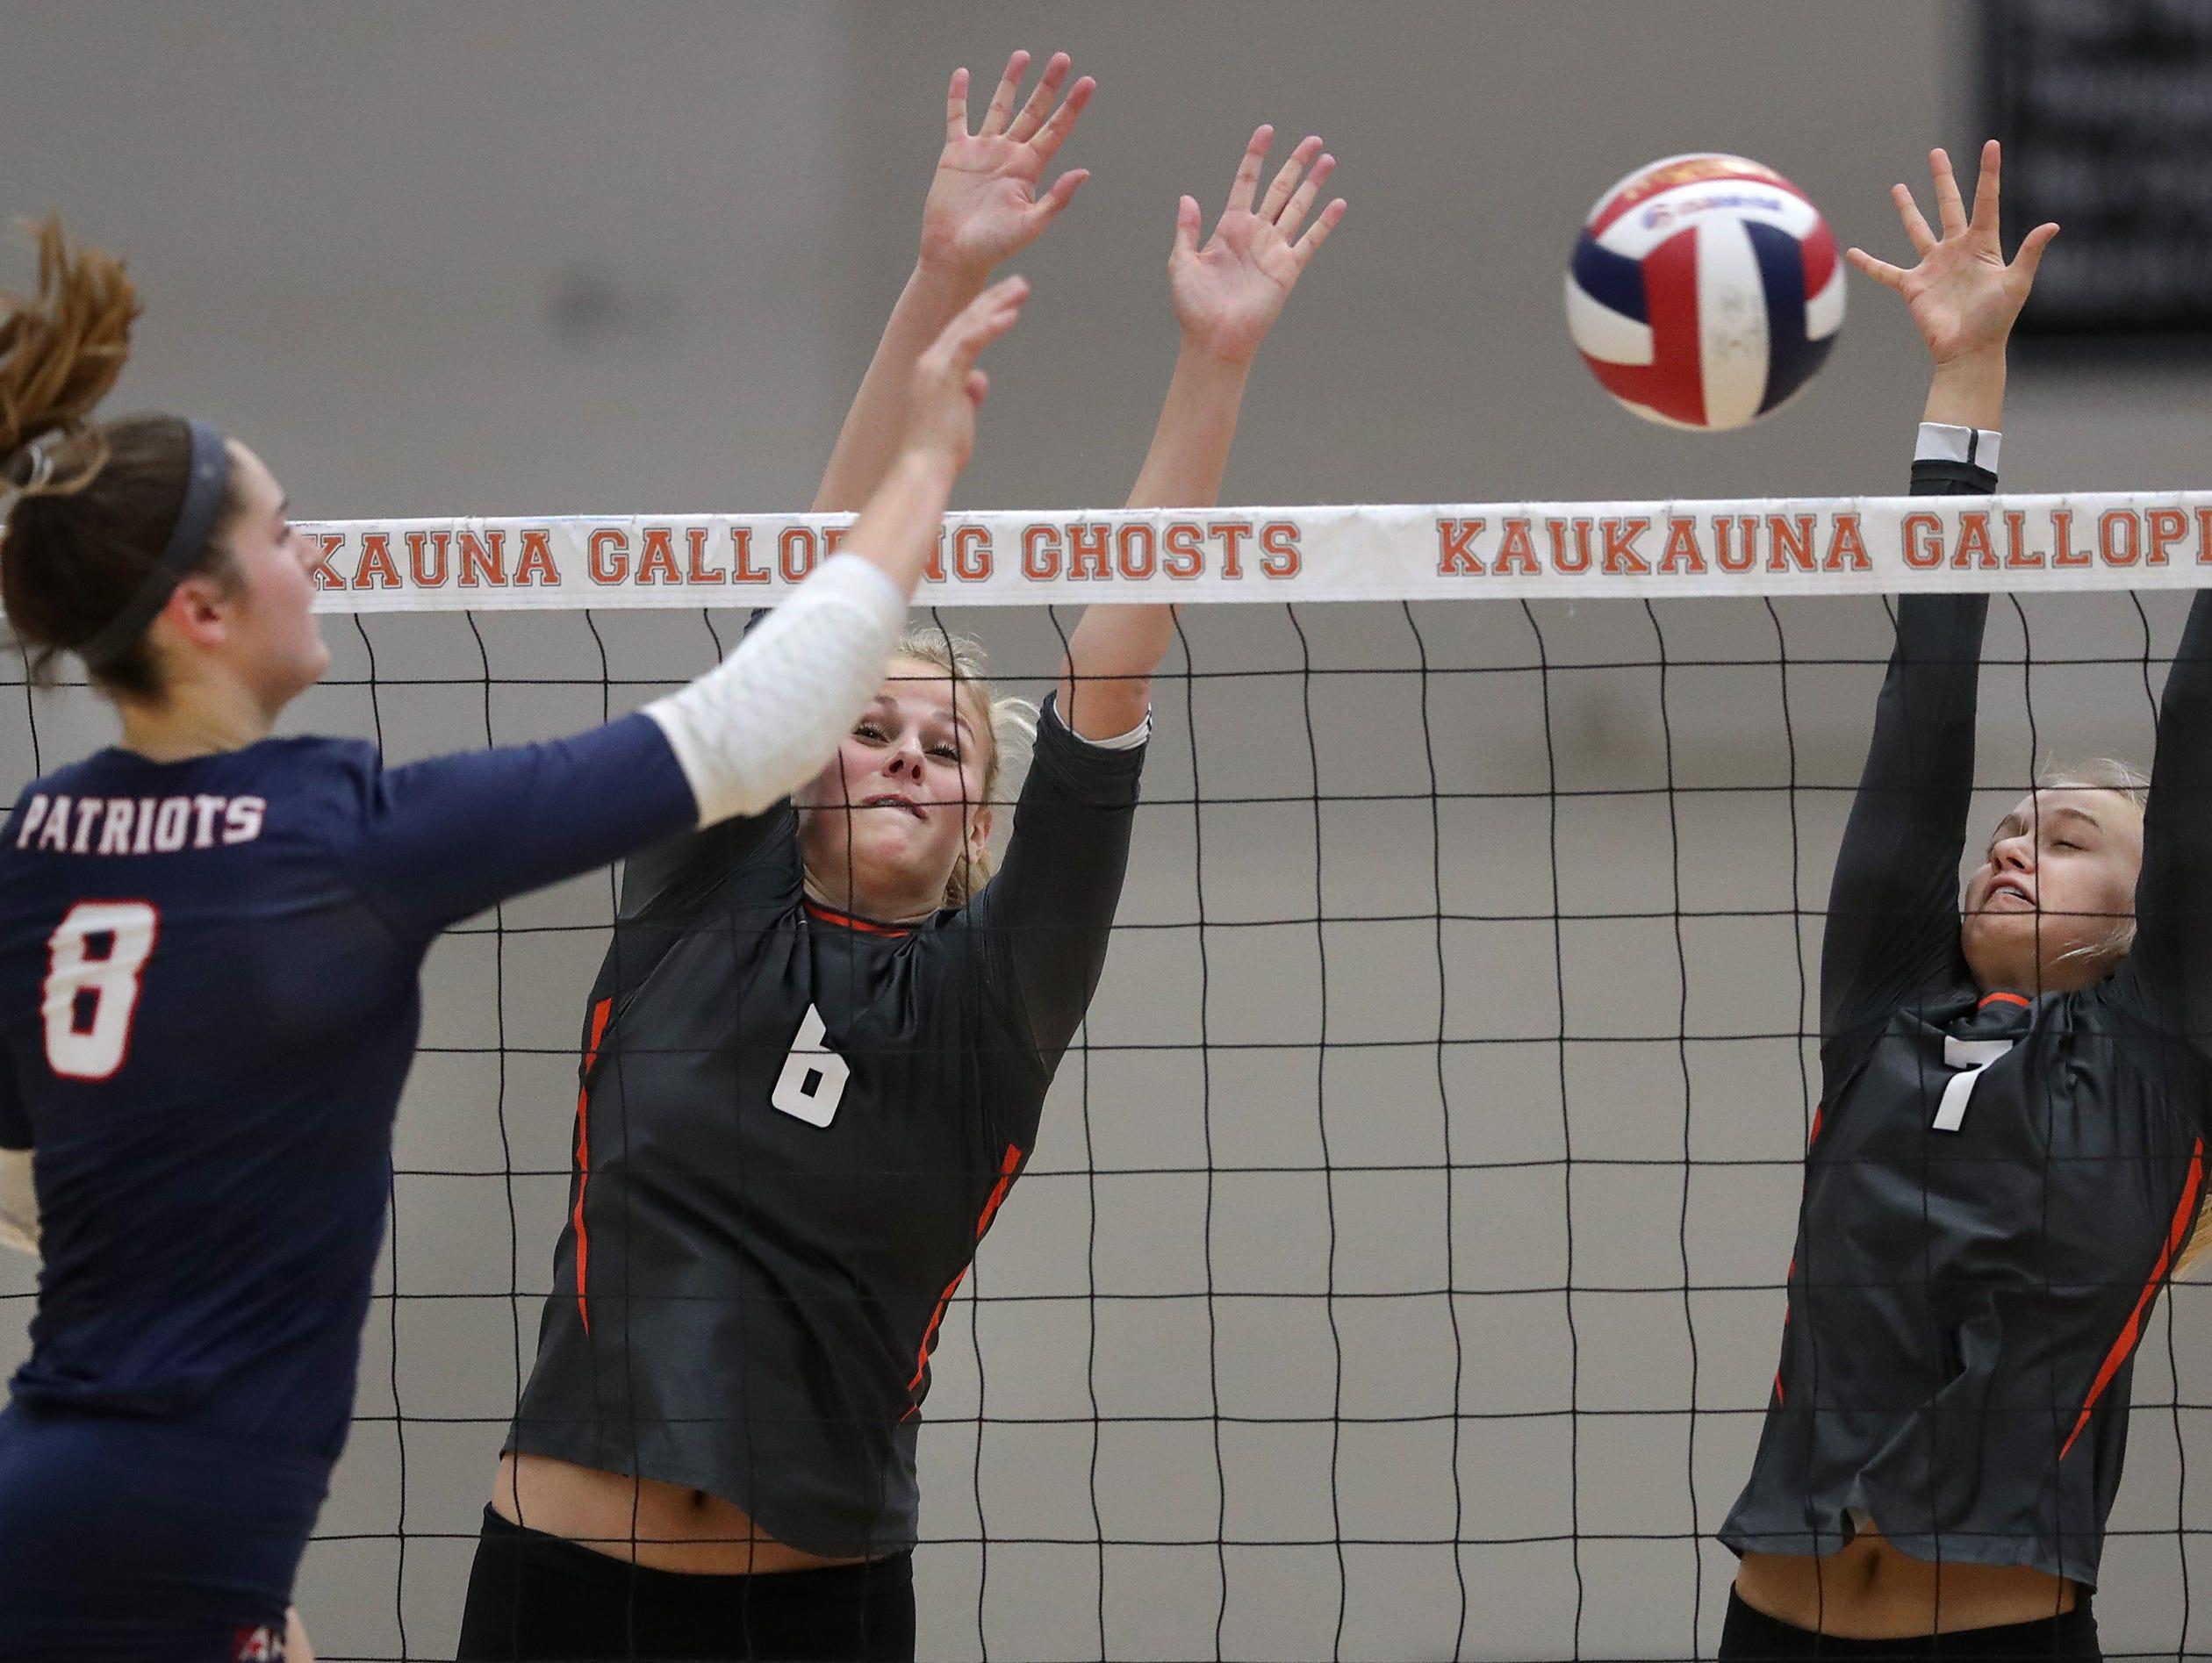 Appleton East High School's #8 Tiffany Paalman against Kaukauna High School's #6 Avery Torrey and #7 Savannah DeValk during their girls volleyball game on Thursday, October 11, 2018, in Kaukauna, Wis. Wm. Glasheen/USA TODAY NETWORK-Wisconsin.